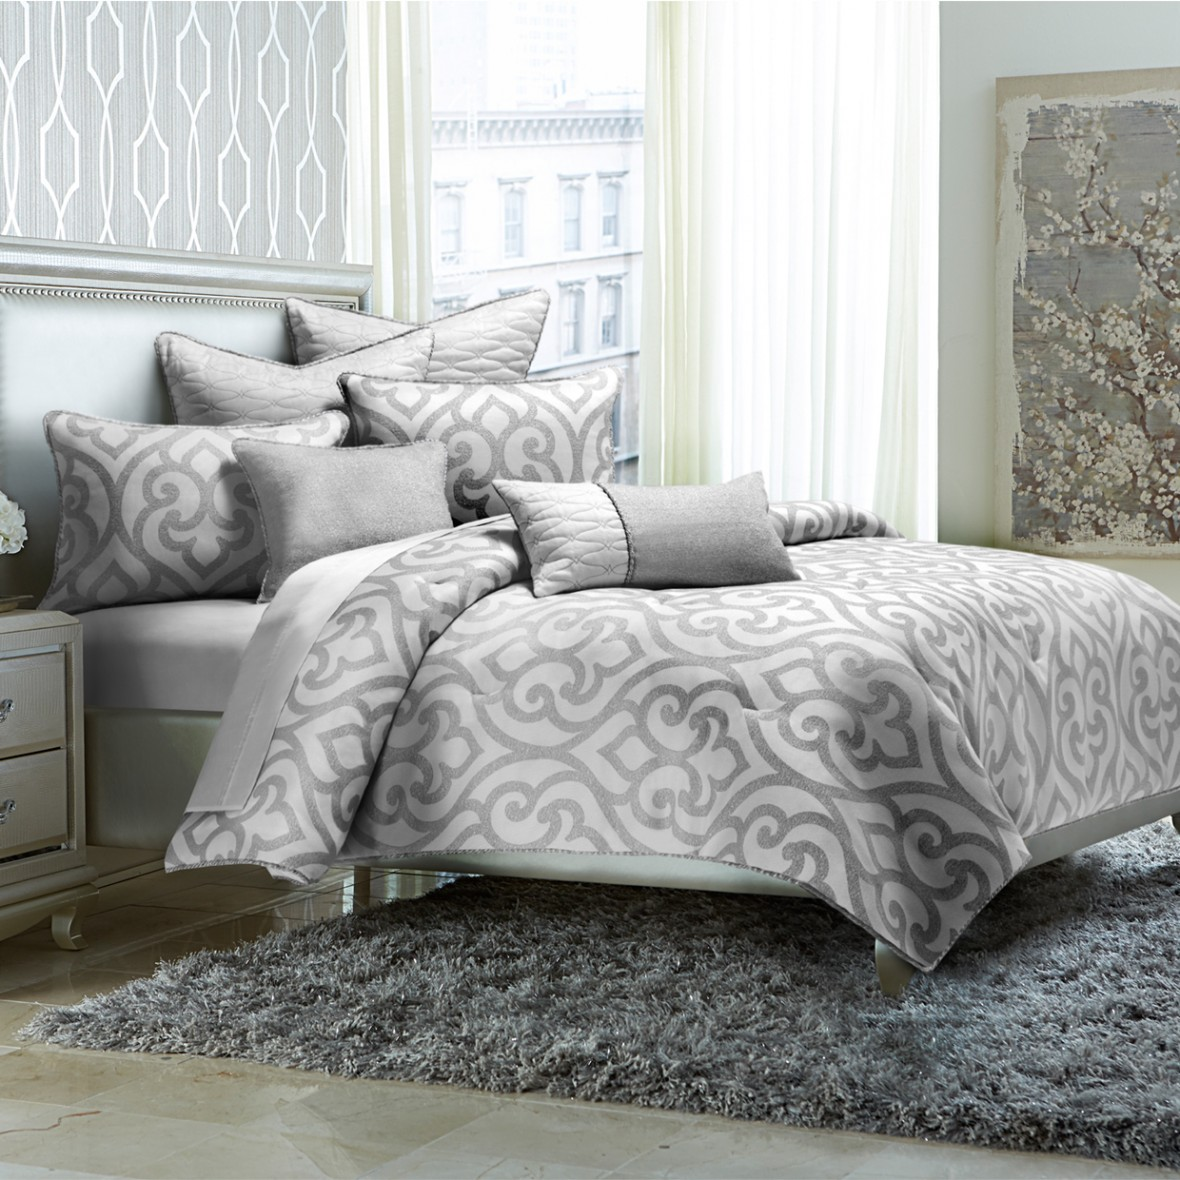 """Canterbury"" Декоративное покрывало и подушки, набор из 8 предметов  (King) цвет Silver"